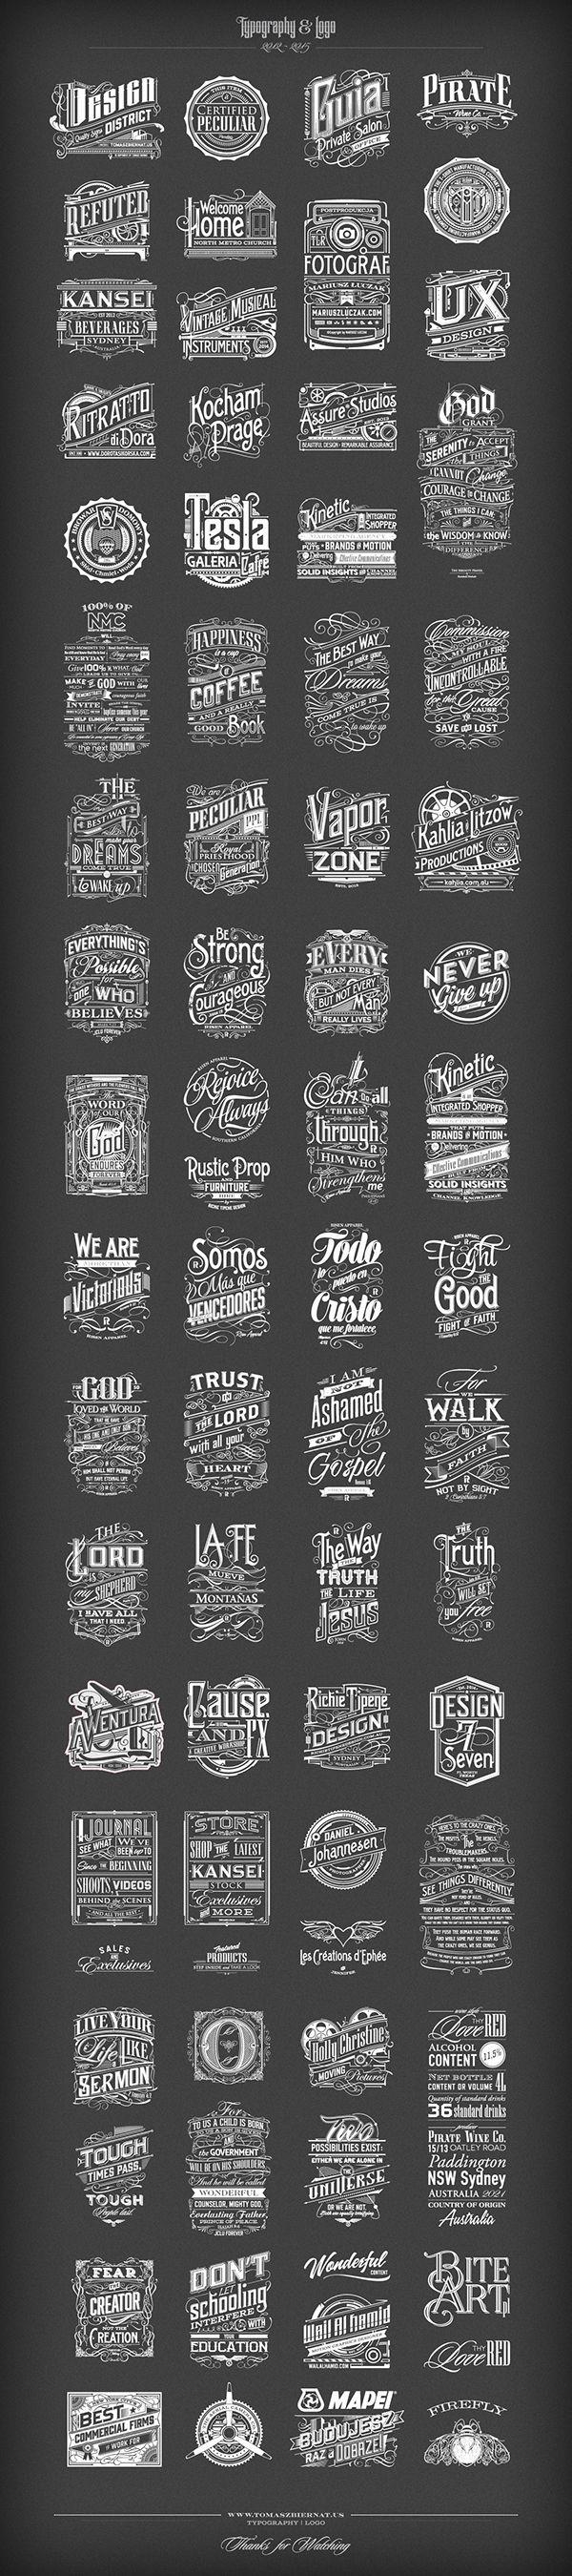 Some Typography | Logo 2012-2015 :)